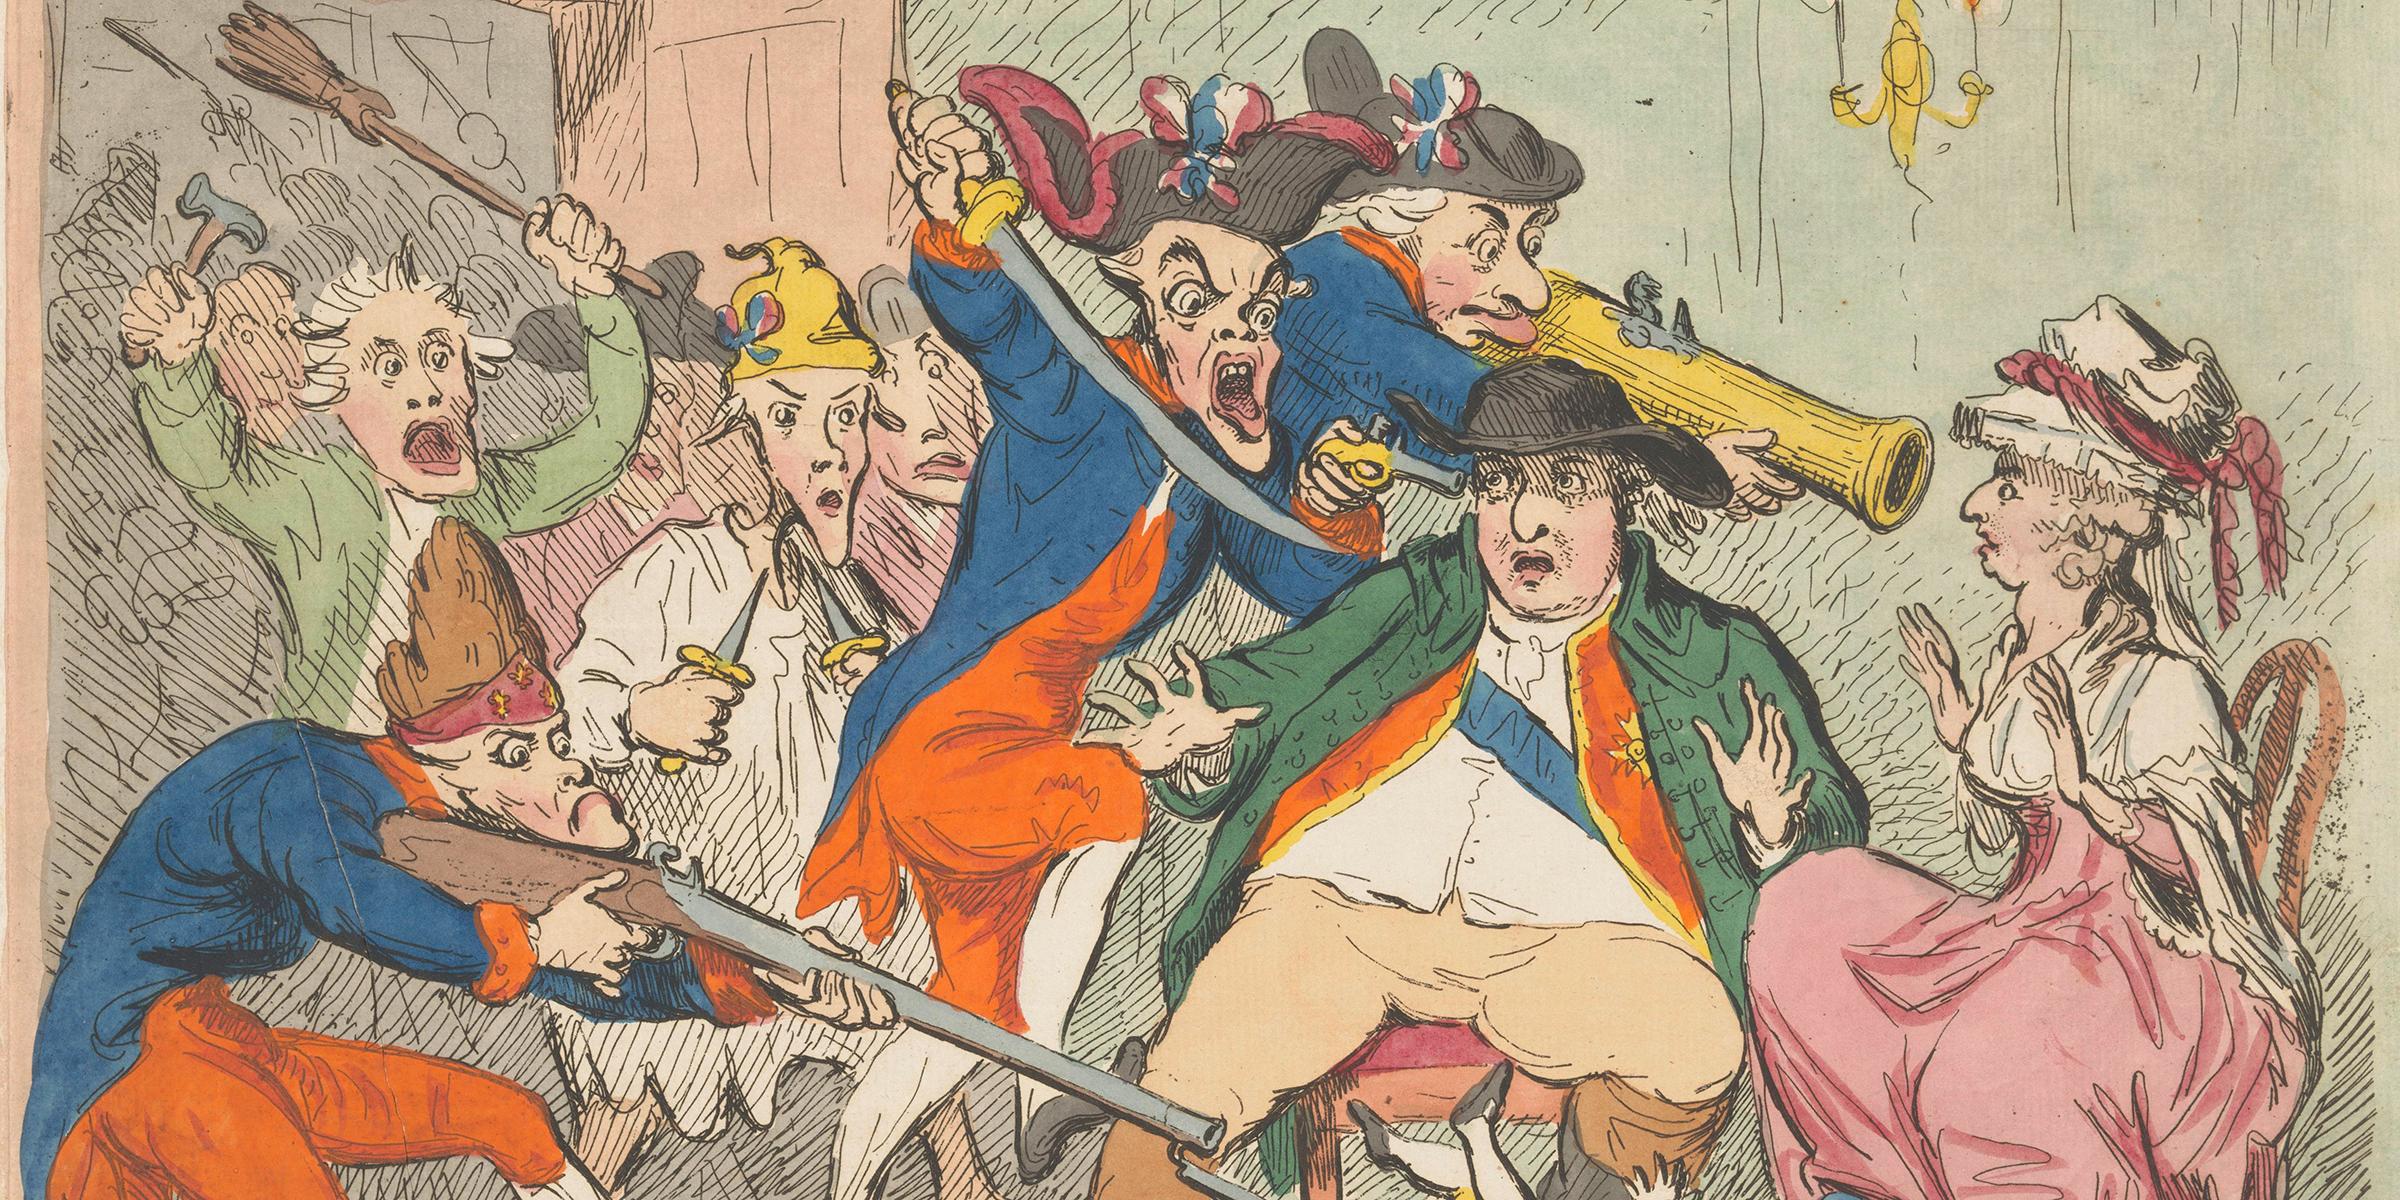 French Democrats Surprising the Royal Runaways (detail), by James Gillray, 1791.